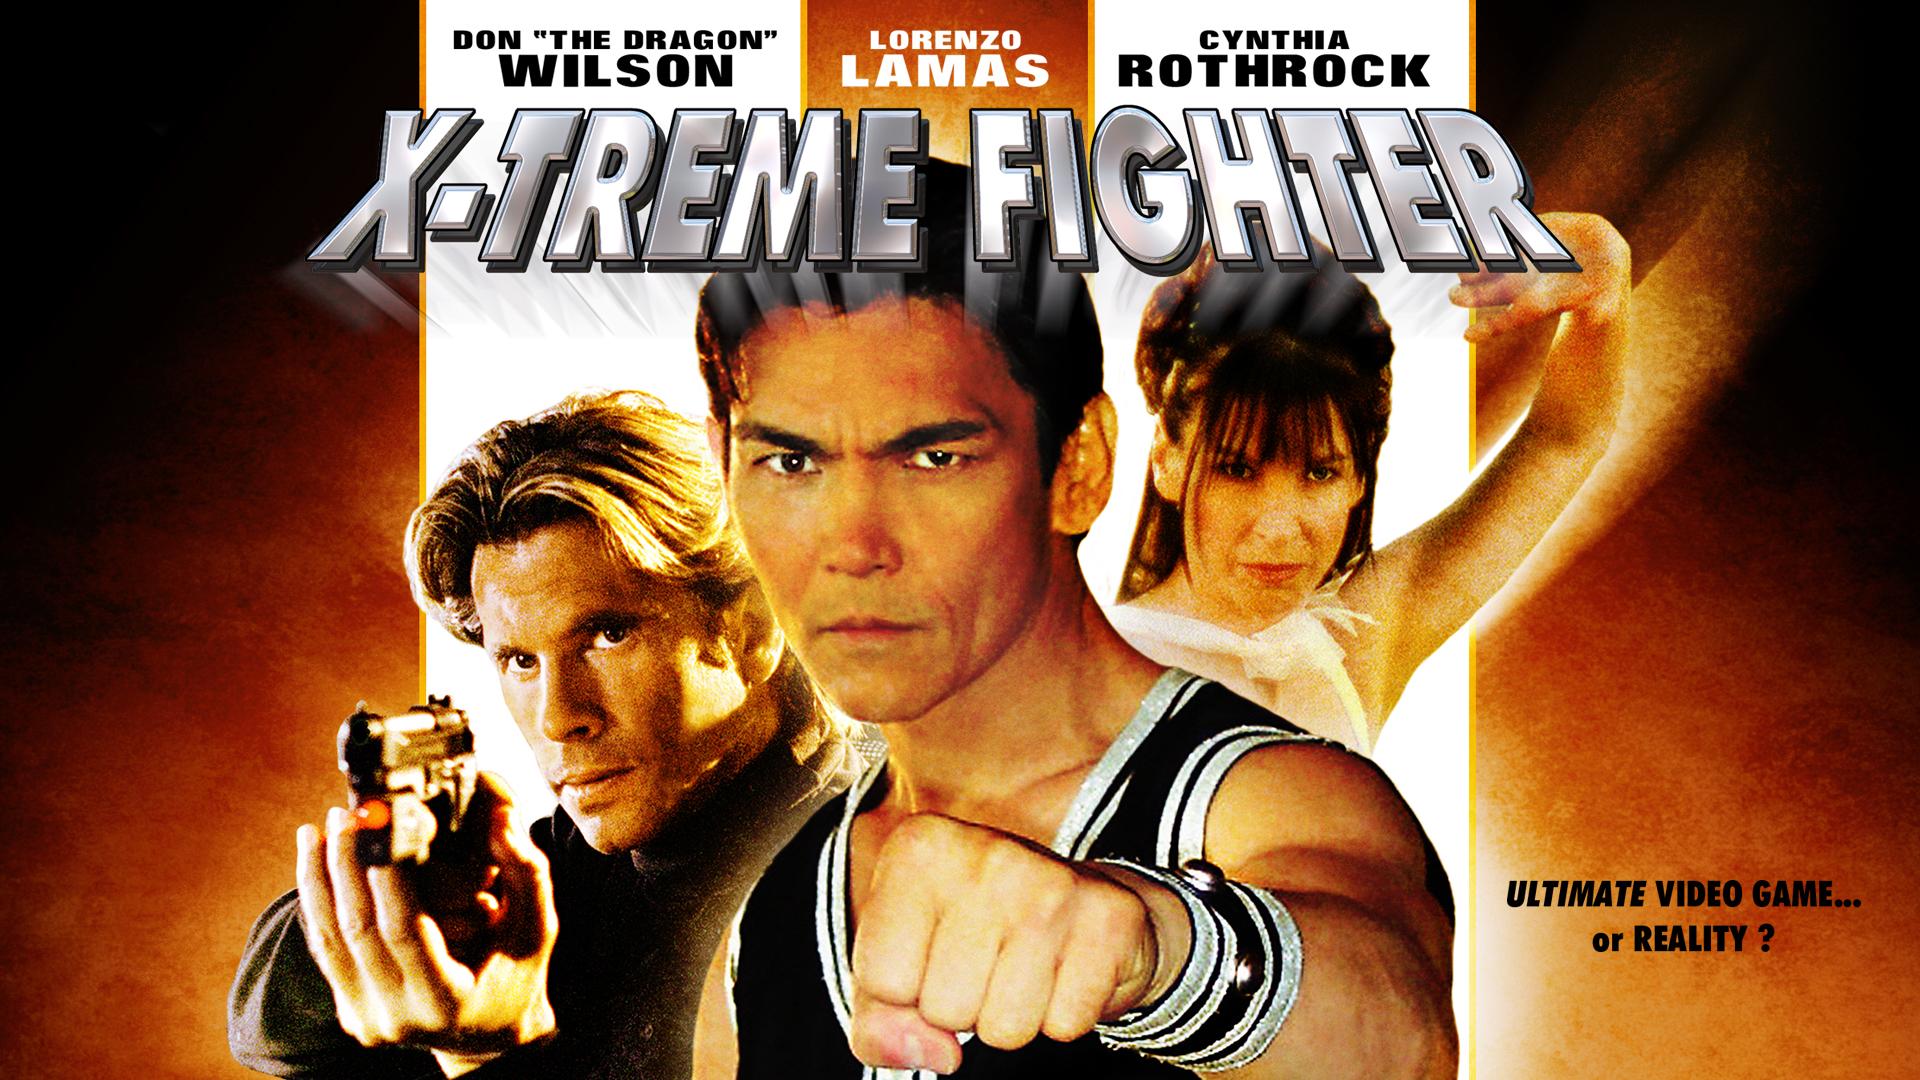 X-Treme Fighter